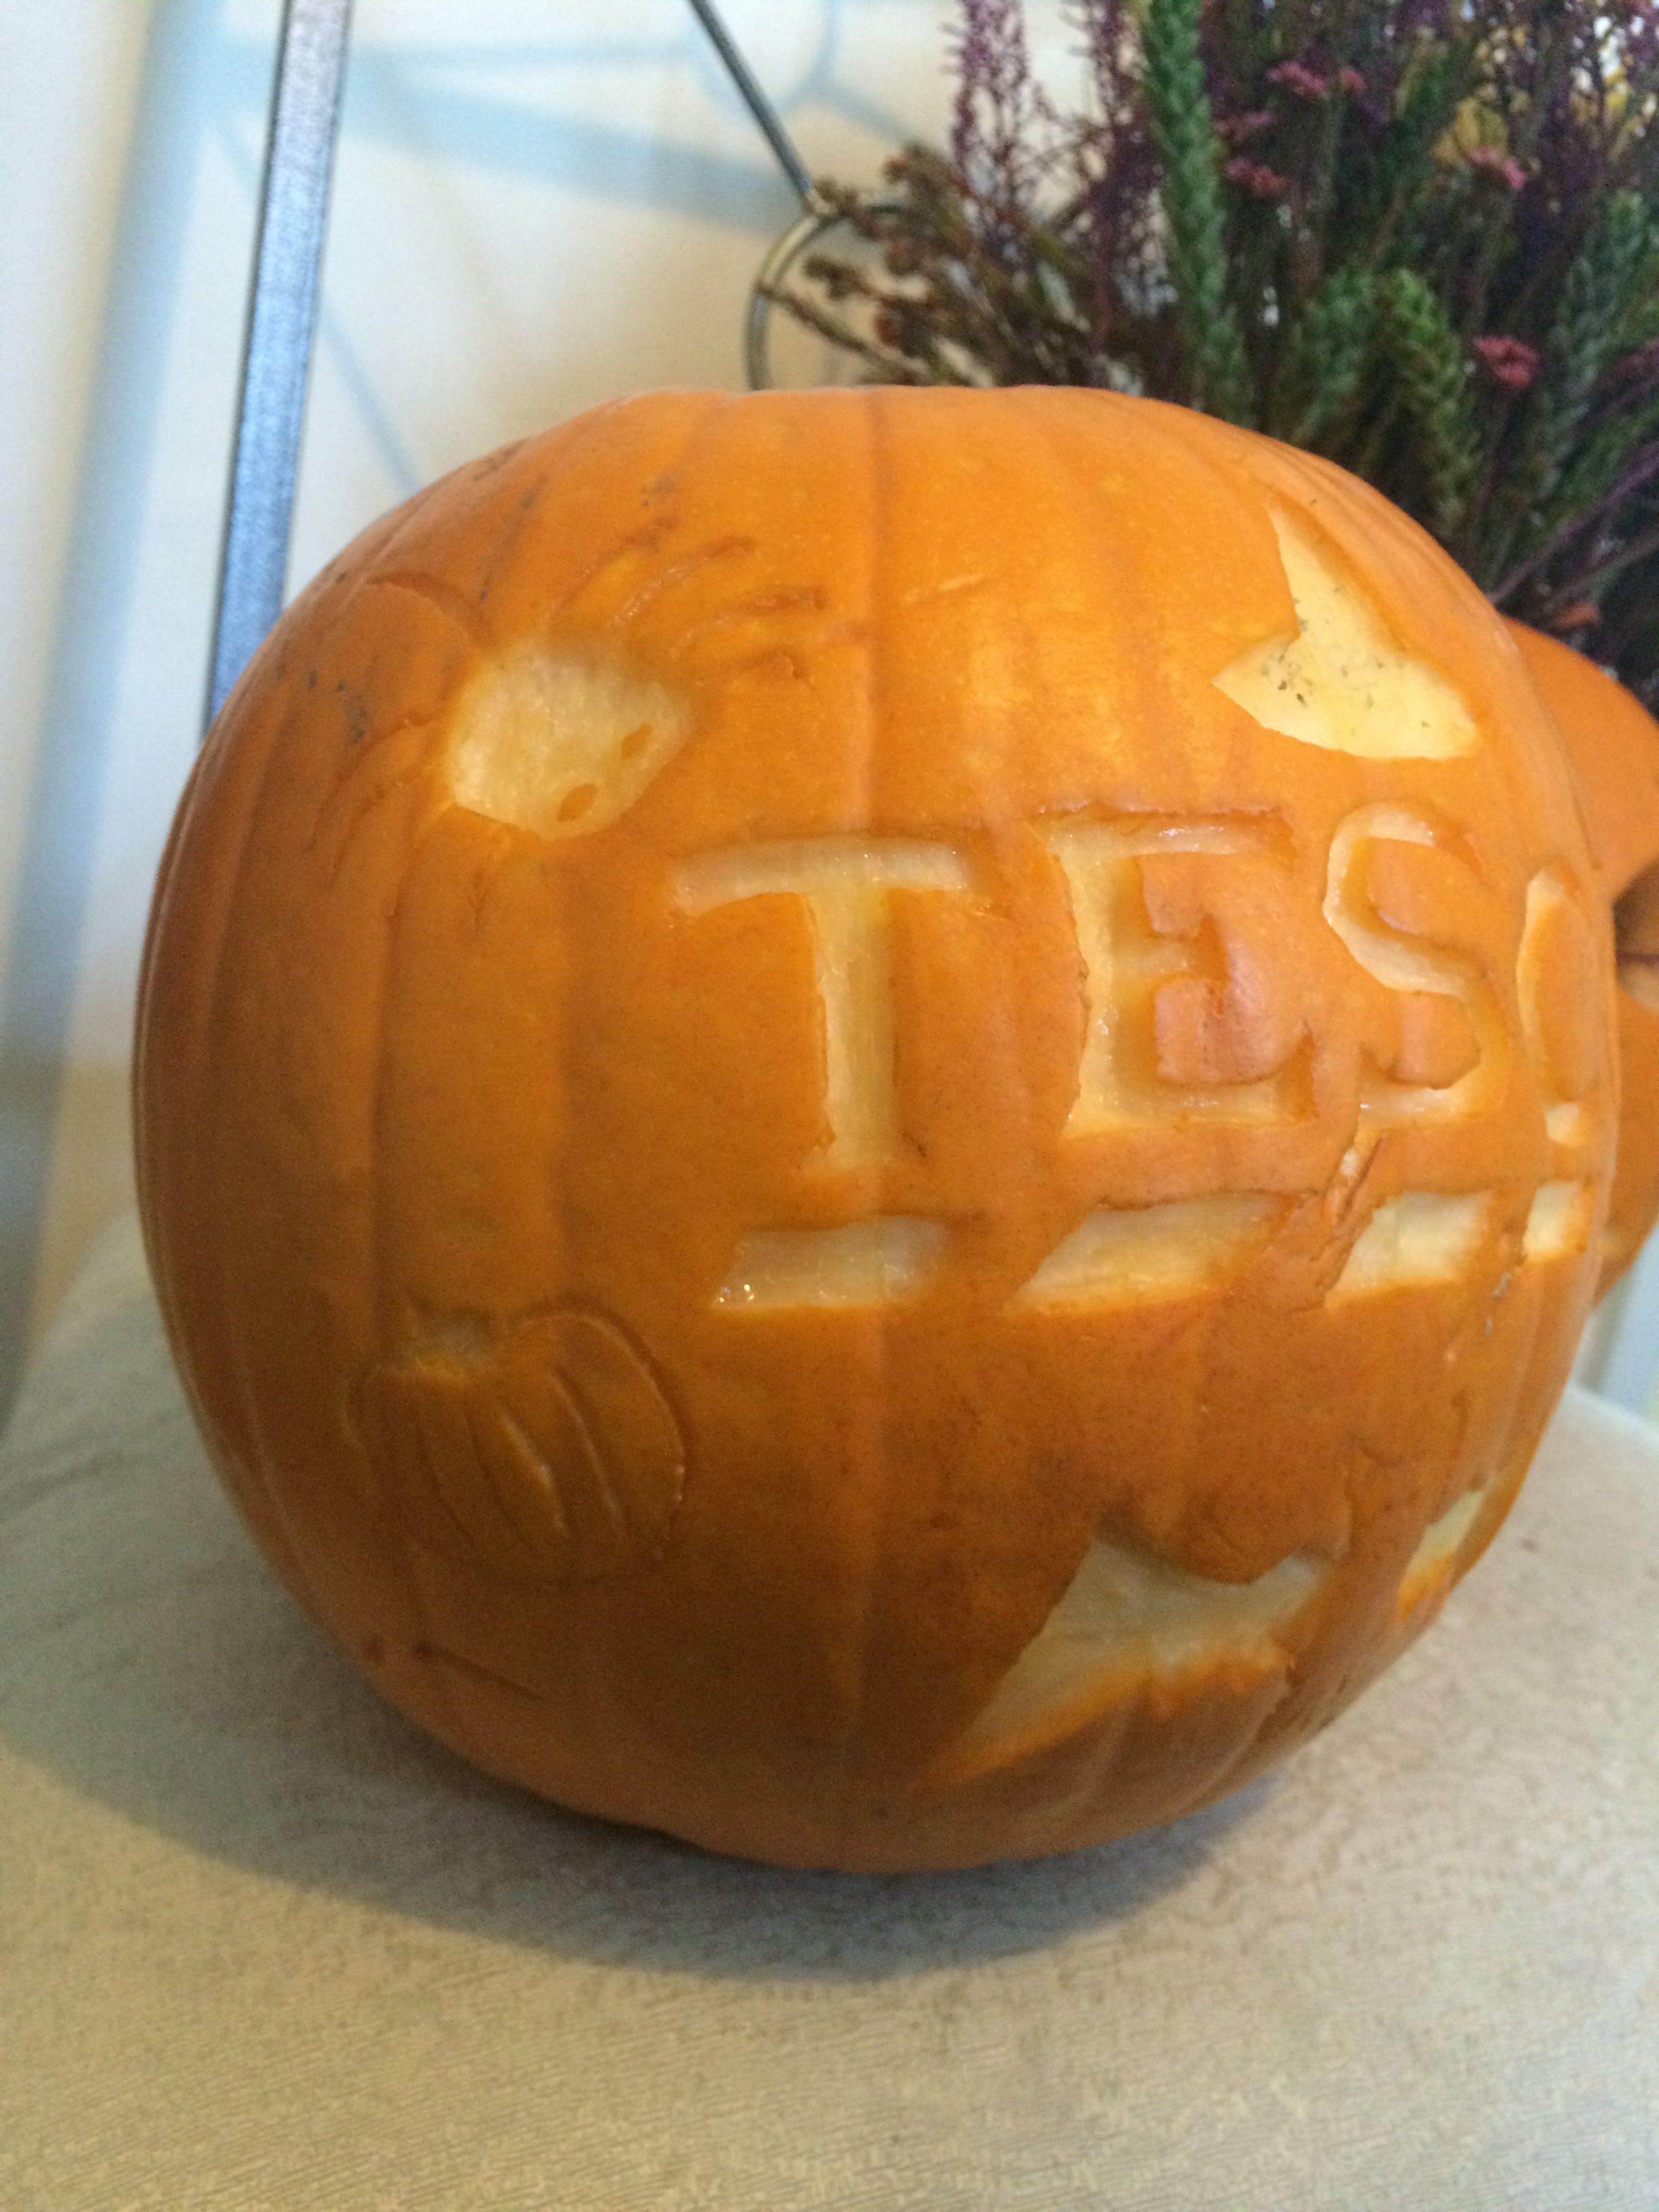 tesco jack o lantern halloween pumpkin | halloween pumpkin carving